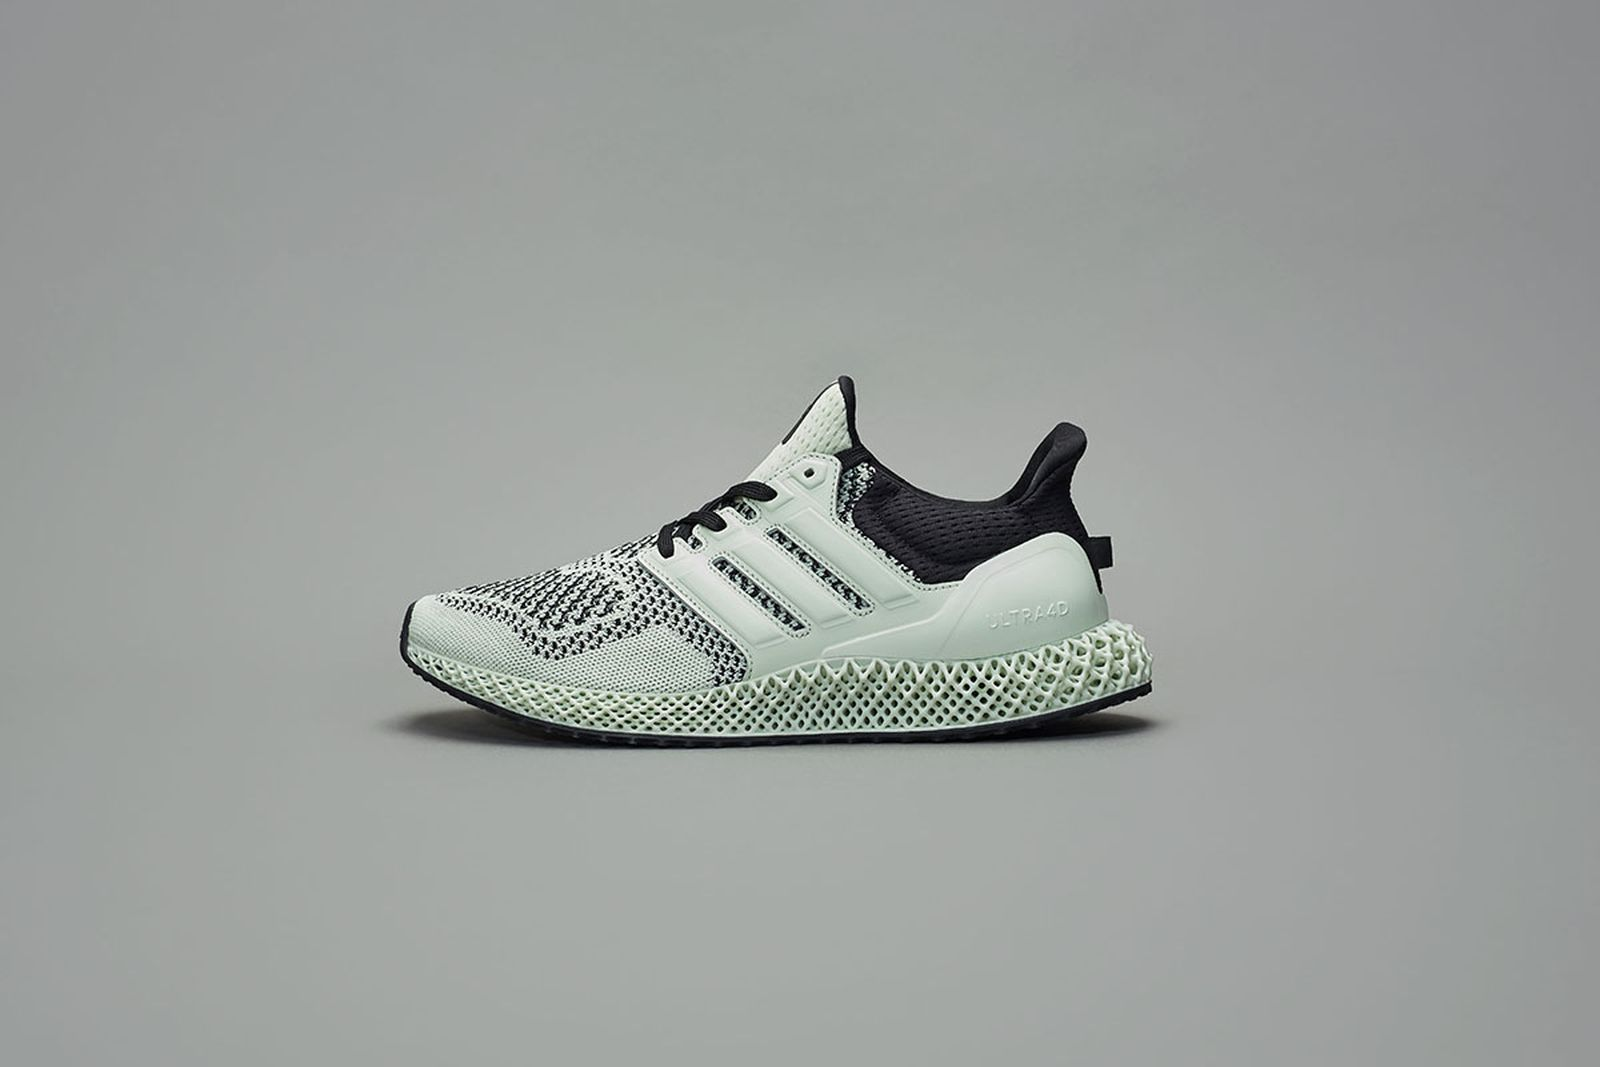 sneakersnstuff-adidas-ultra4d-green-teatime-release-date-price-1-03